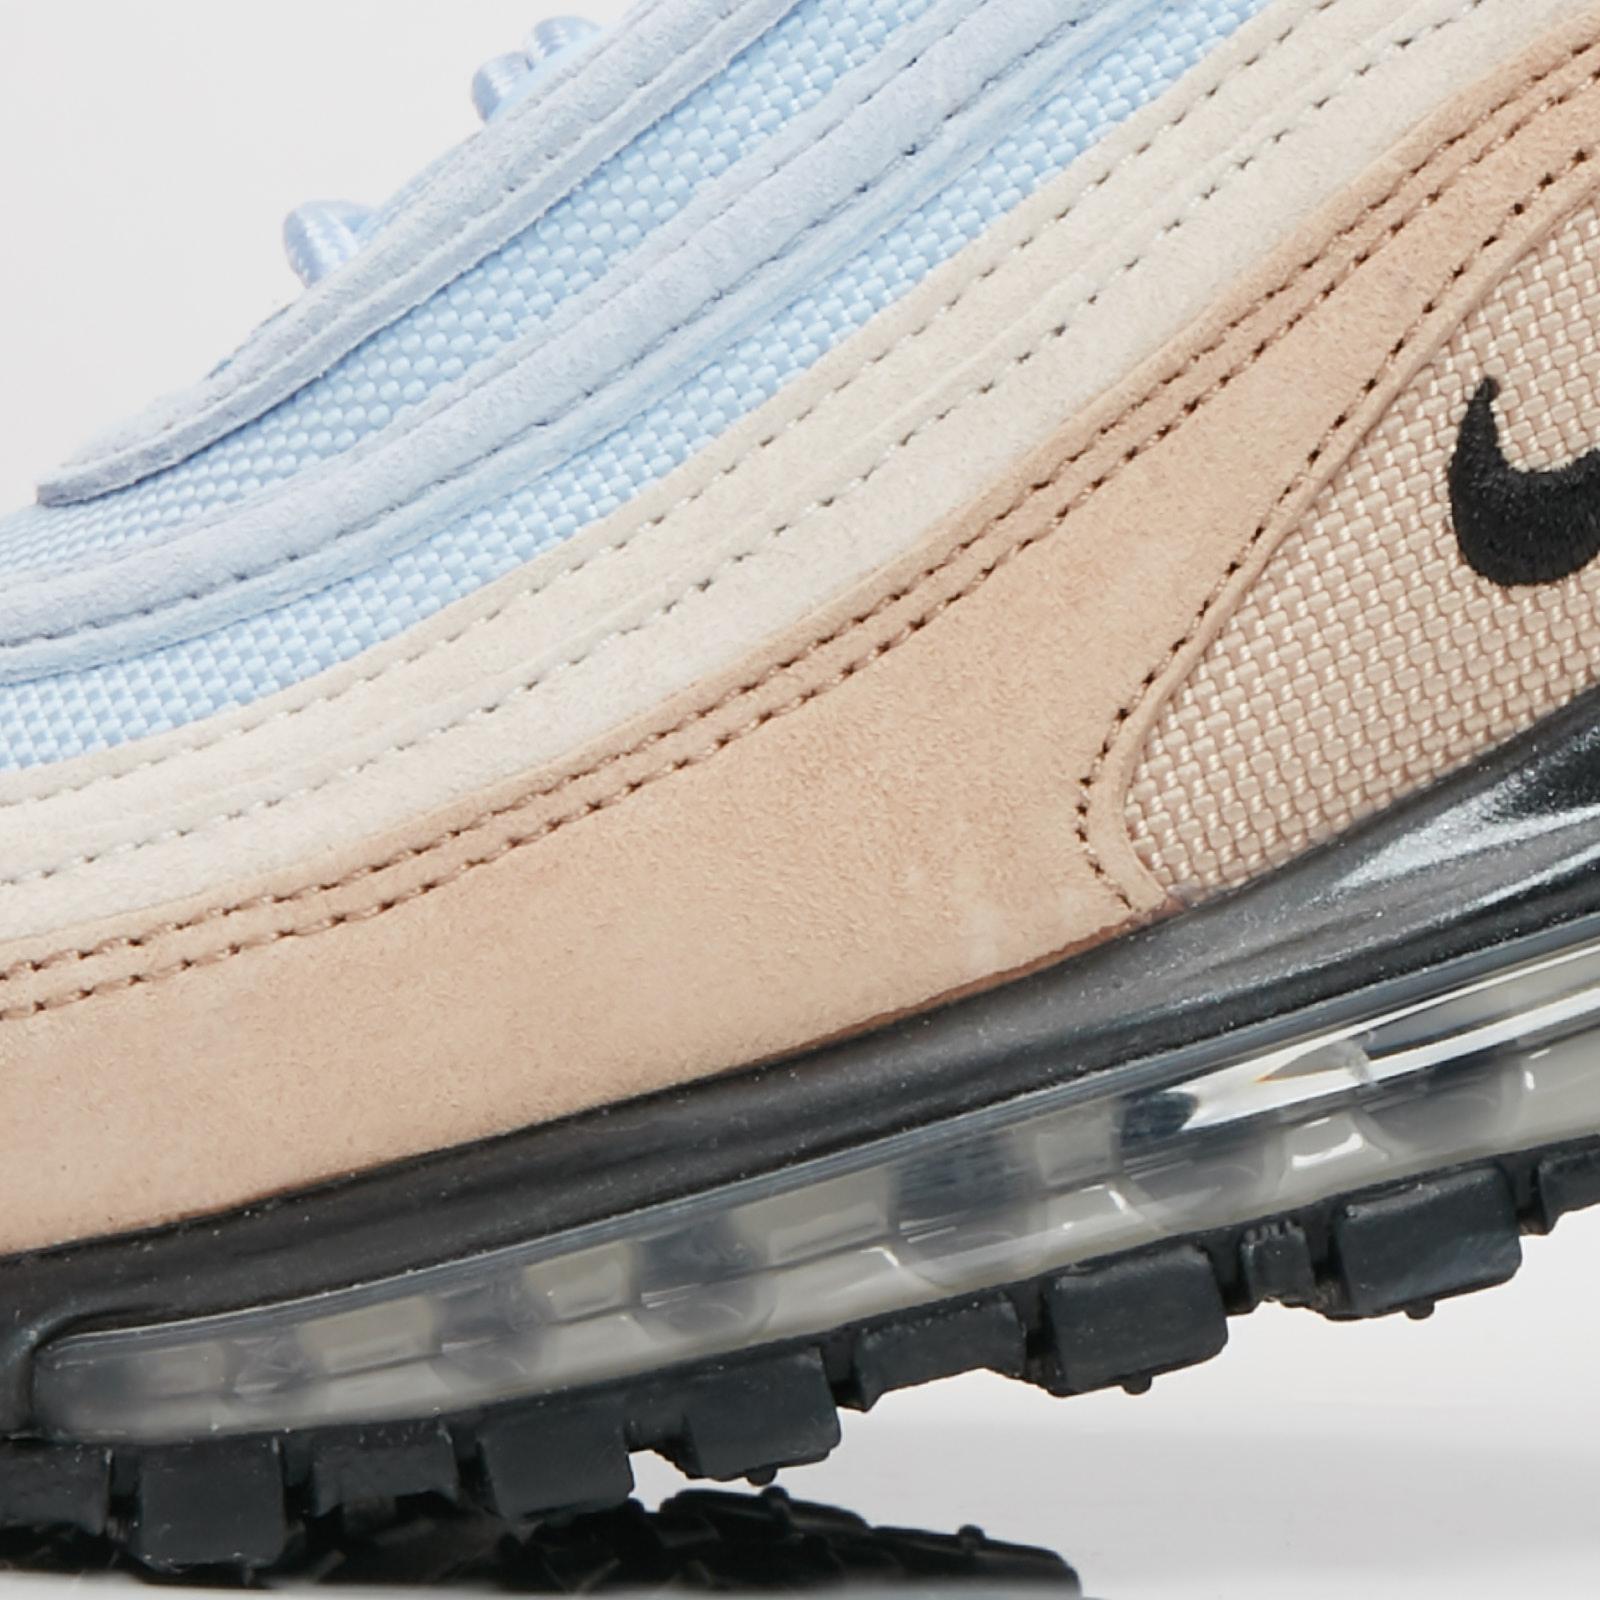 c1beedc69501 Nike Air Max 97 Premium - 312834-203 - Sneakersnstuff